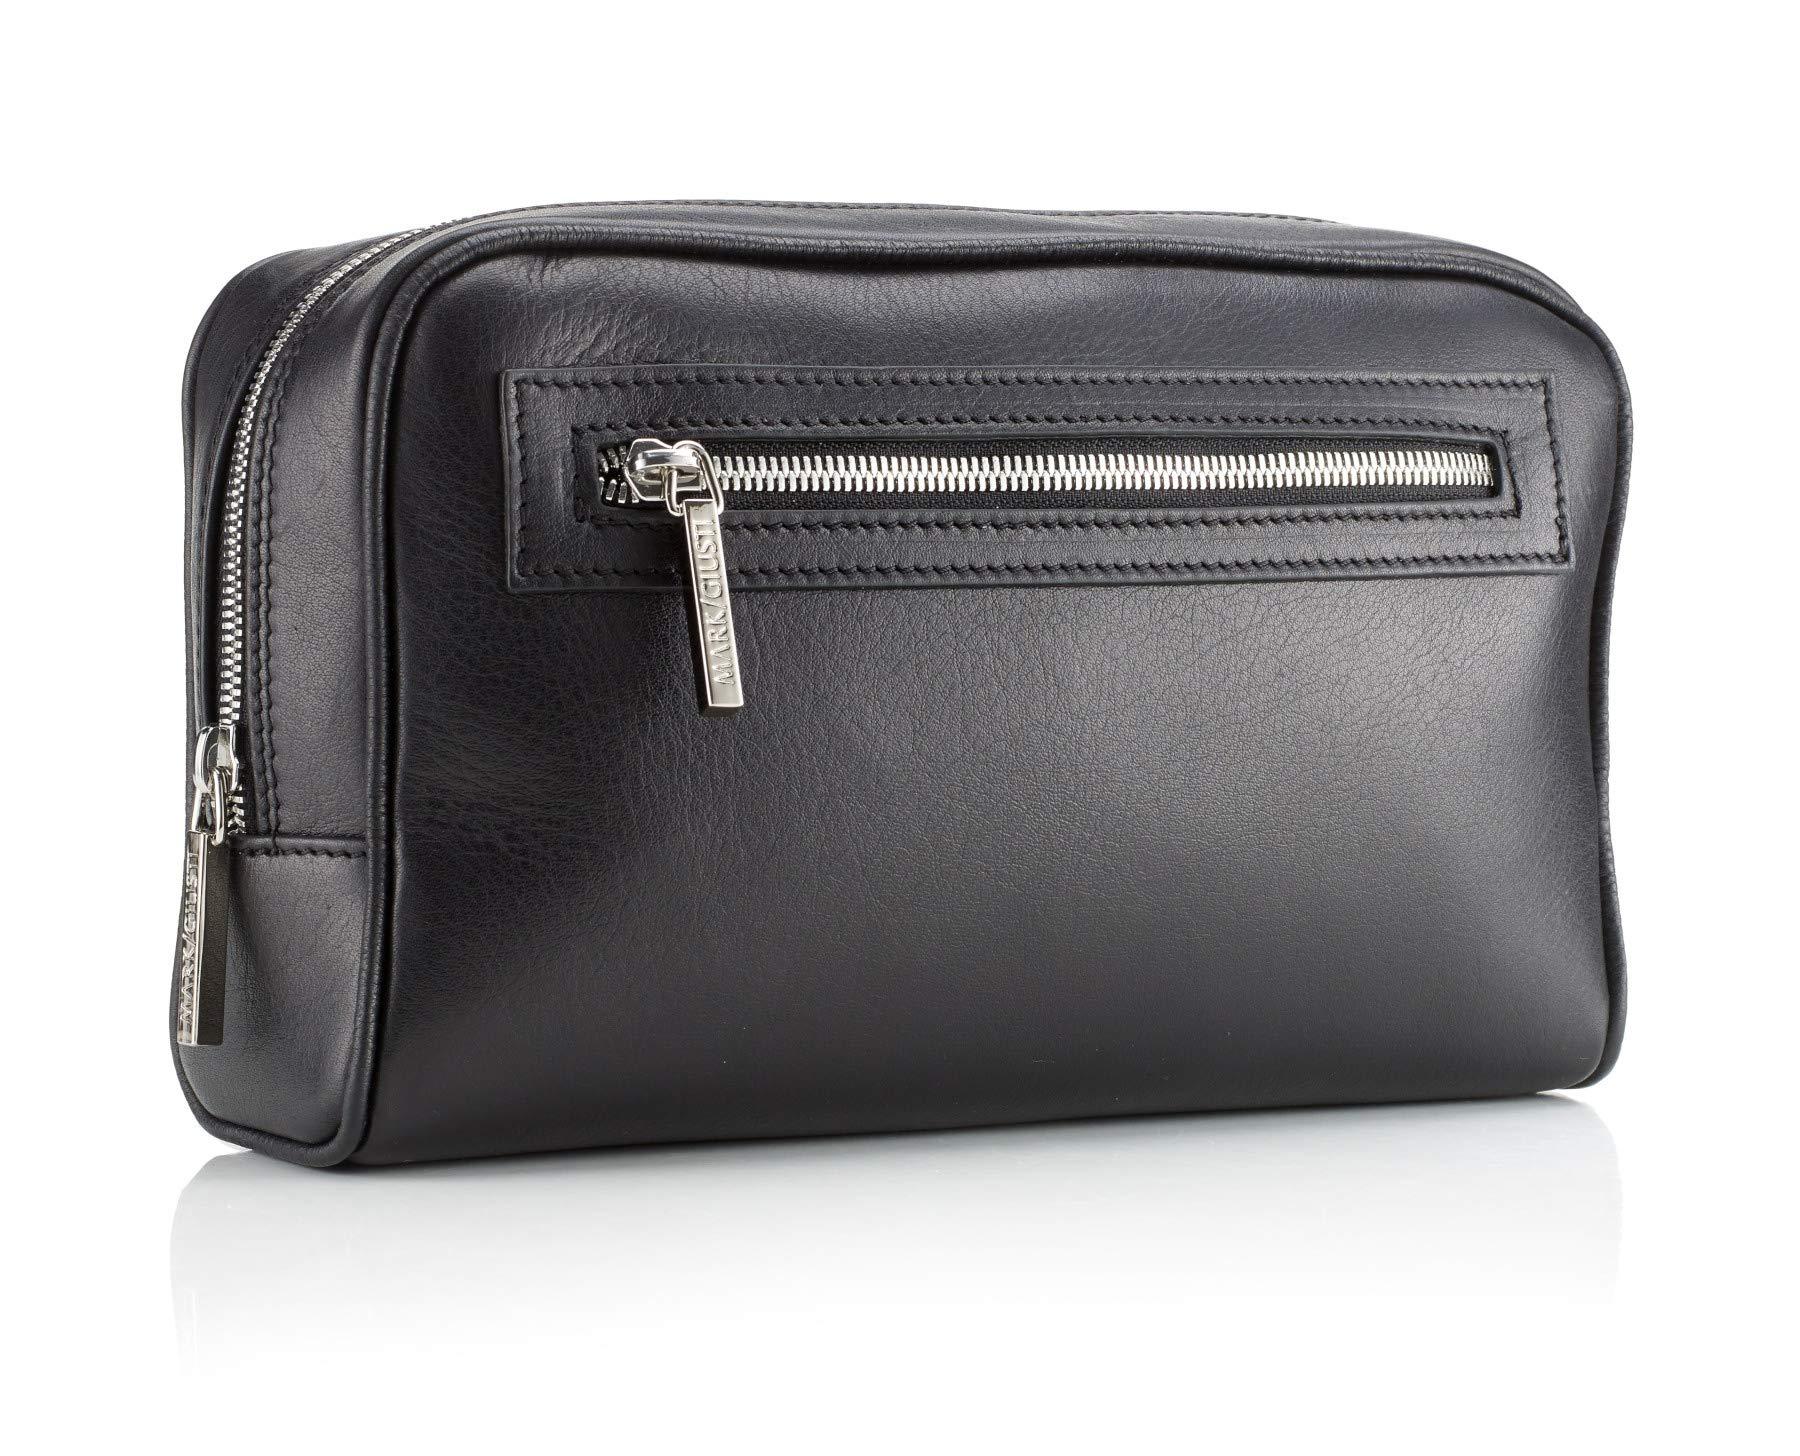 Mark Giusti Canal Nappa Leather Pochette (Black)